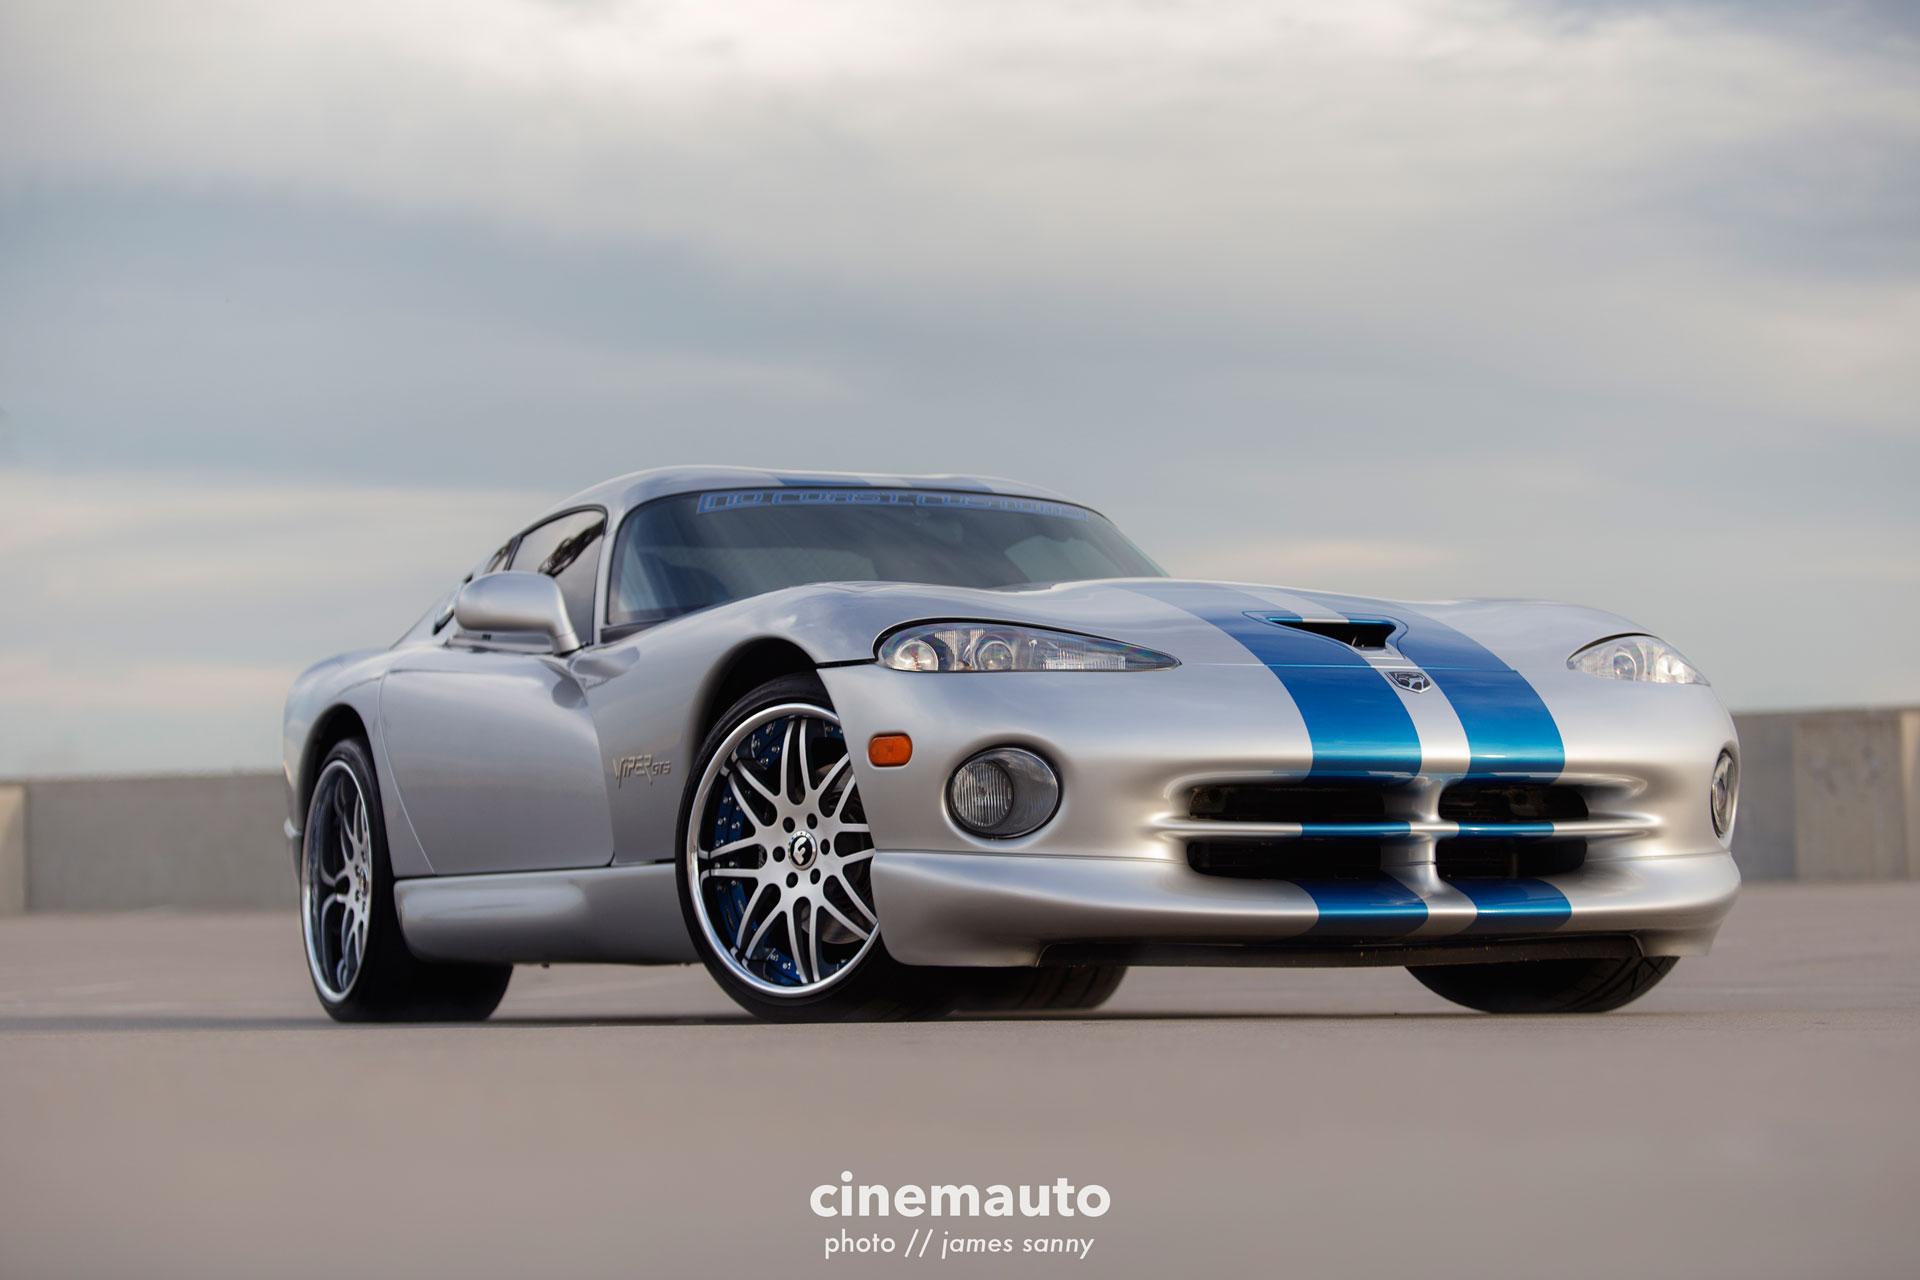 cinemauto-wichita-automotive-photography-ah7-sm.jpg